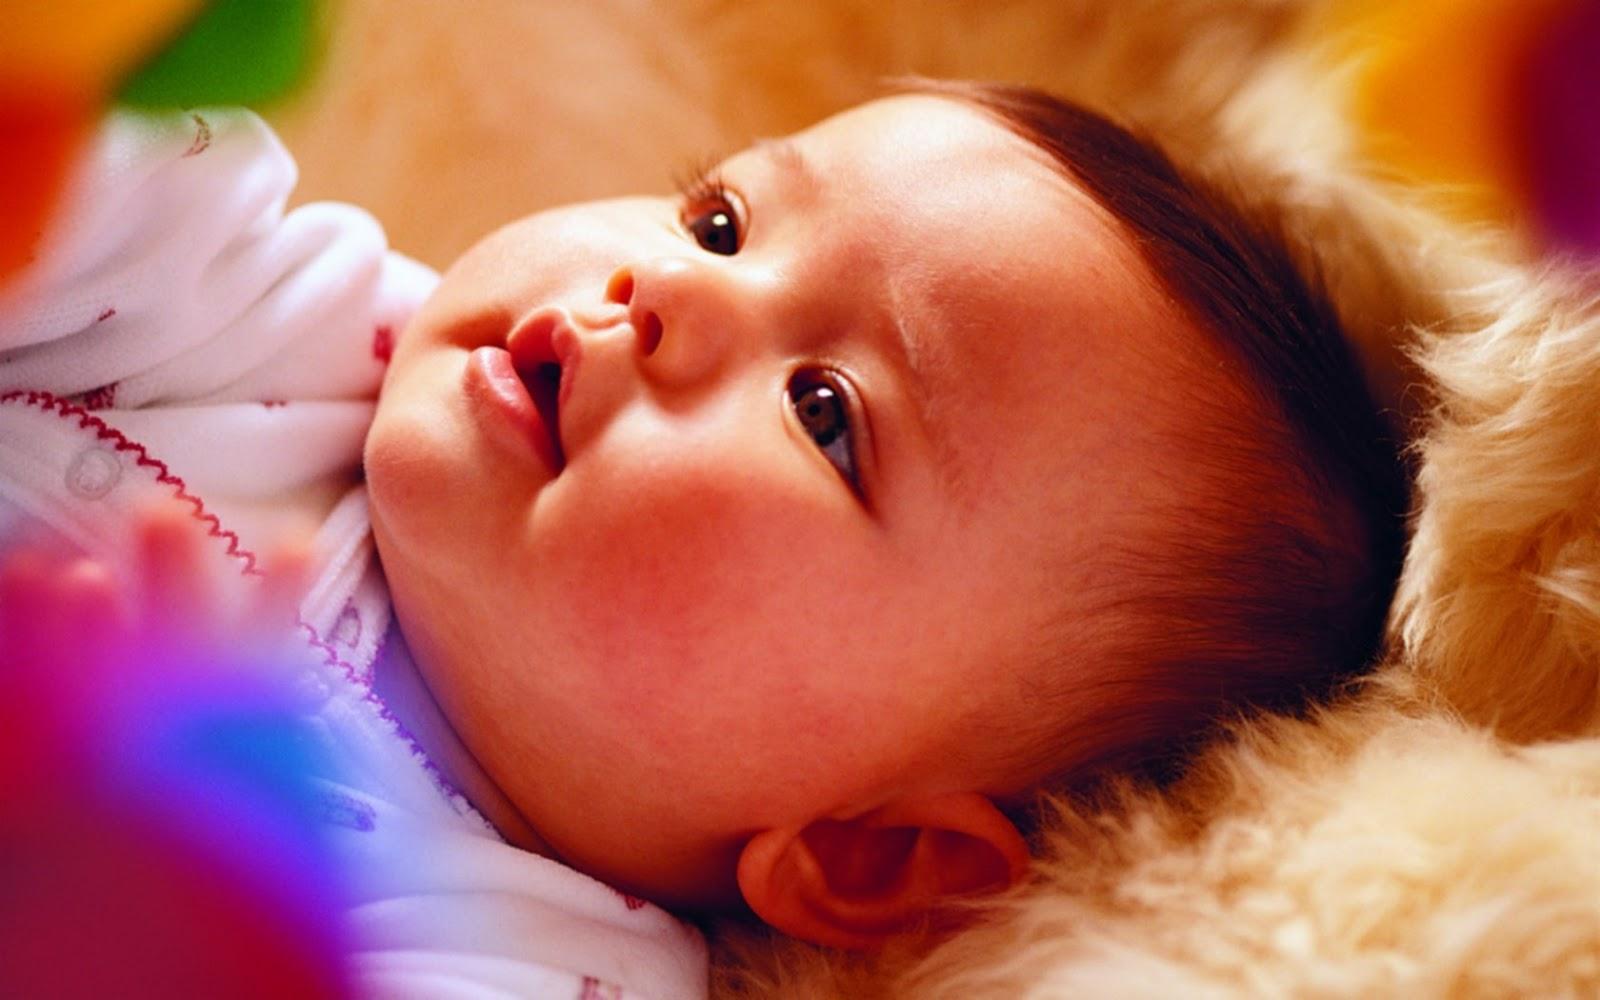 Cute Baby Wallpapers Hd: Cute Baby HD Wallpaper